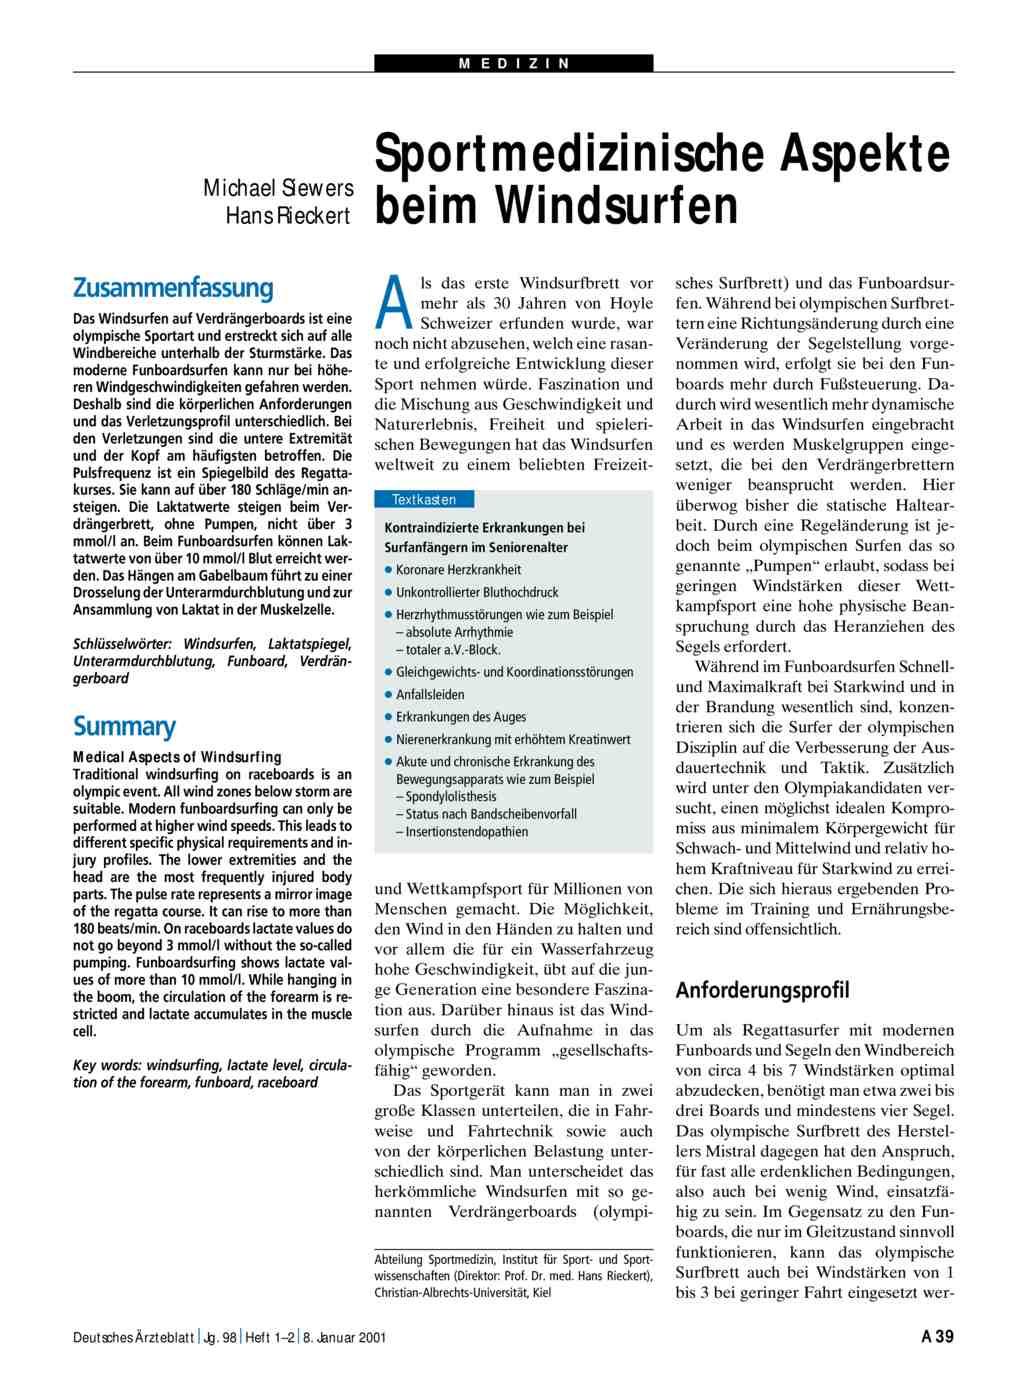 Sportmedizinische Aspekte Beim Windsurfen